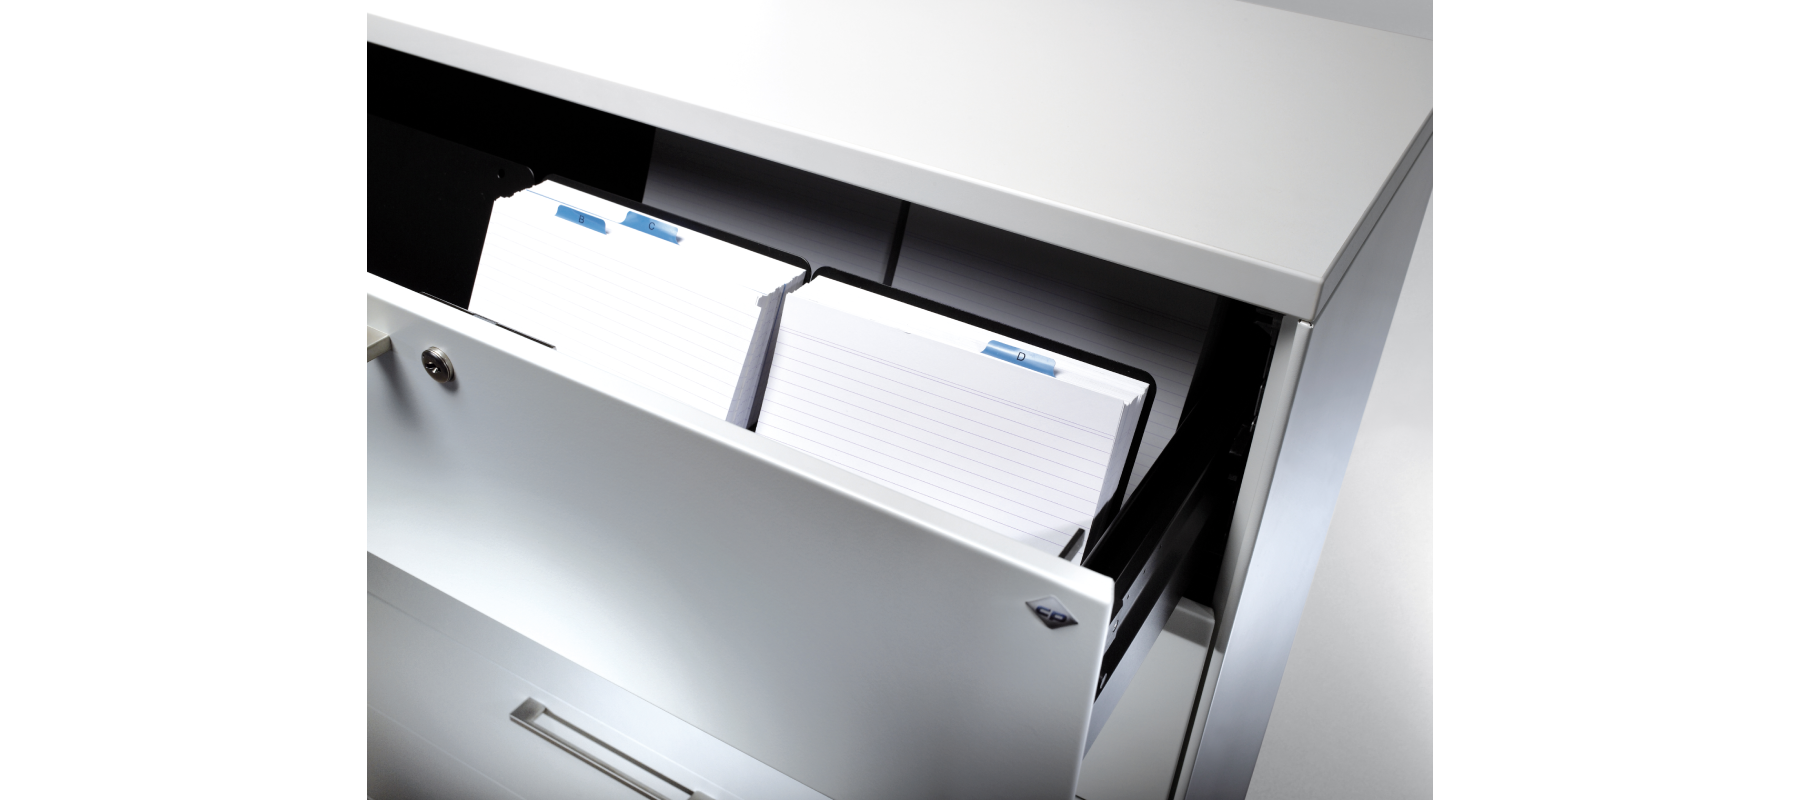 metalowe meble biurowe szafy szufladowe cp detale - 03